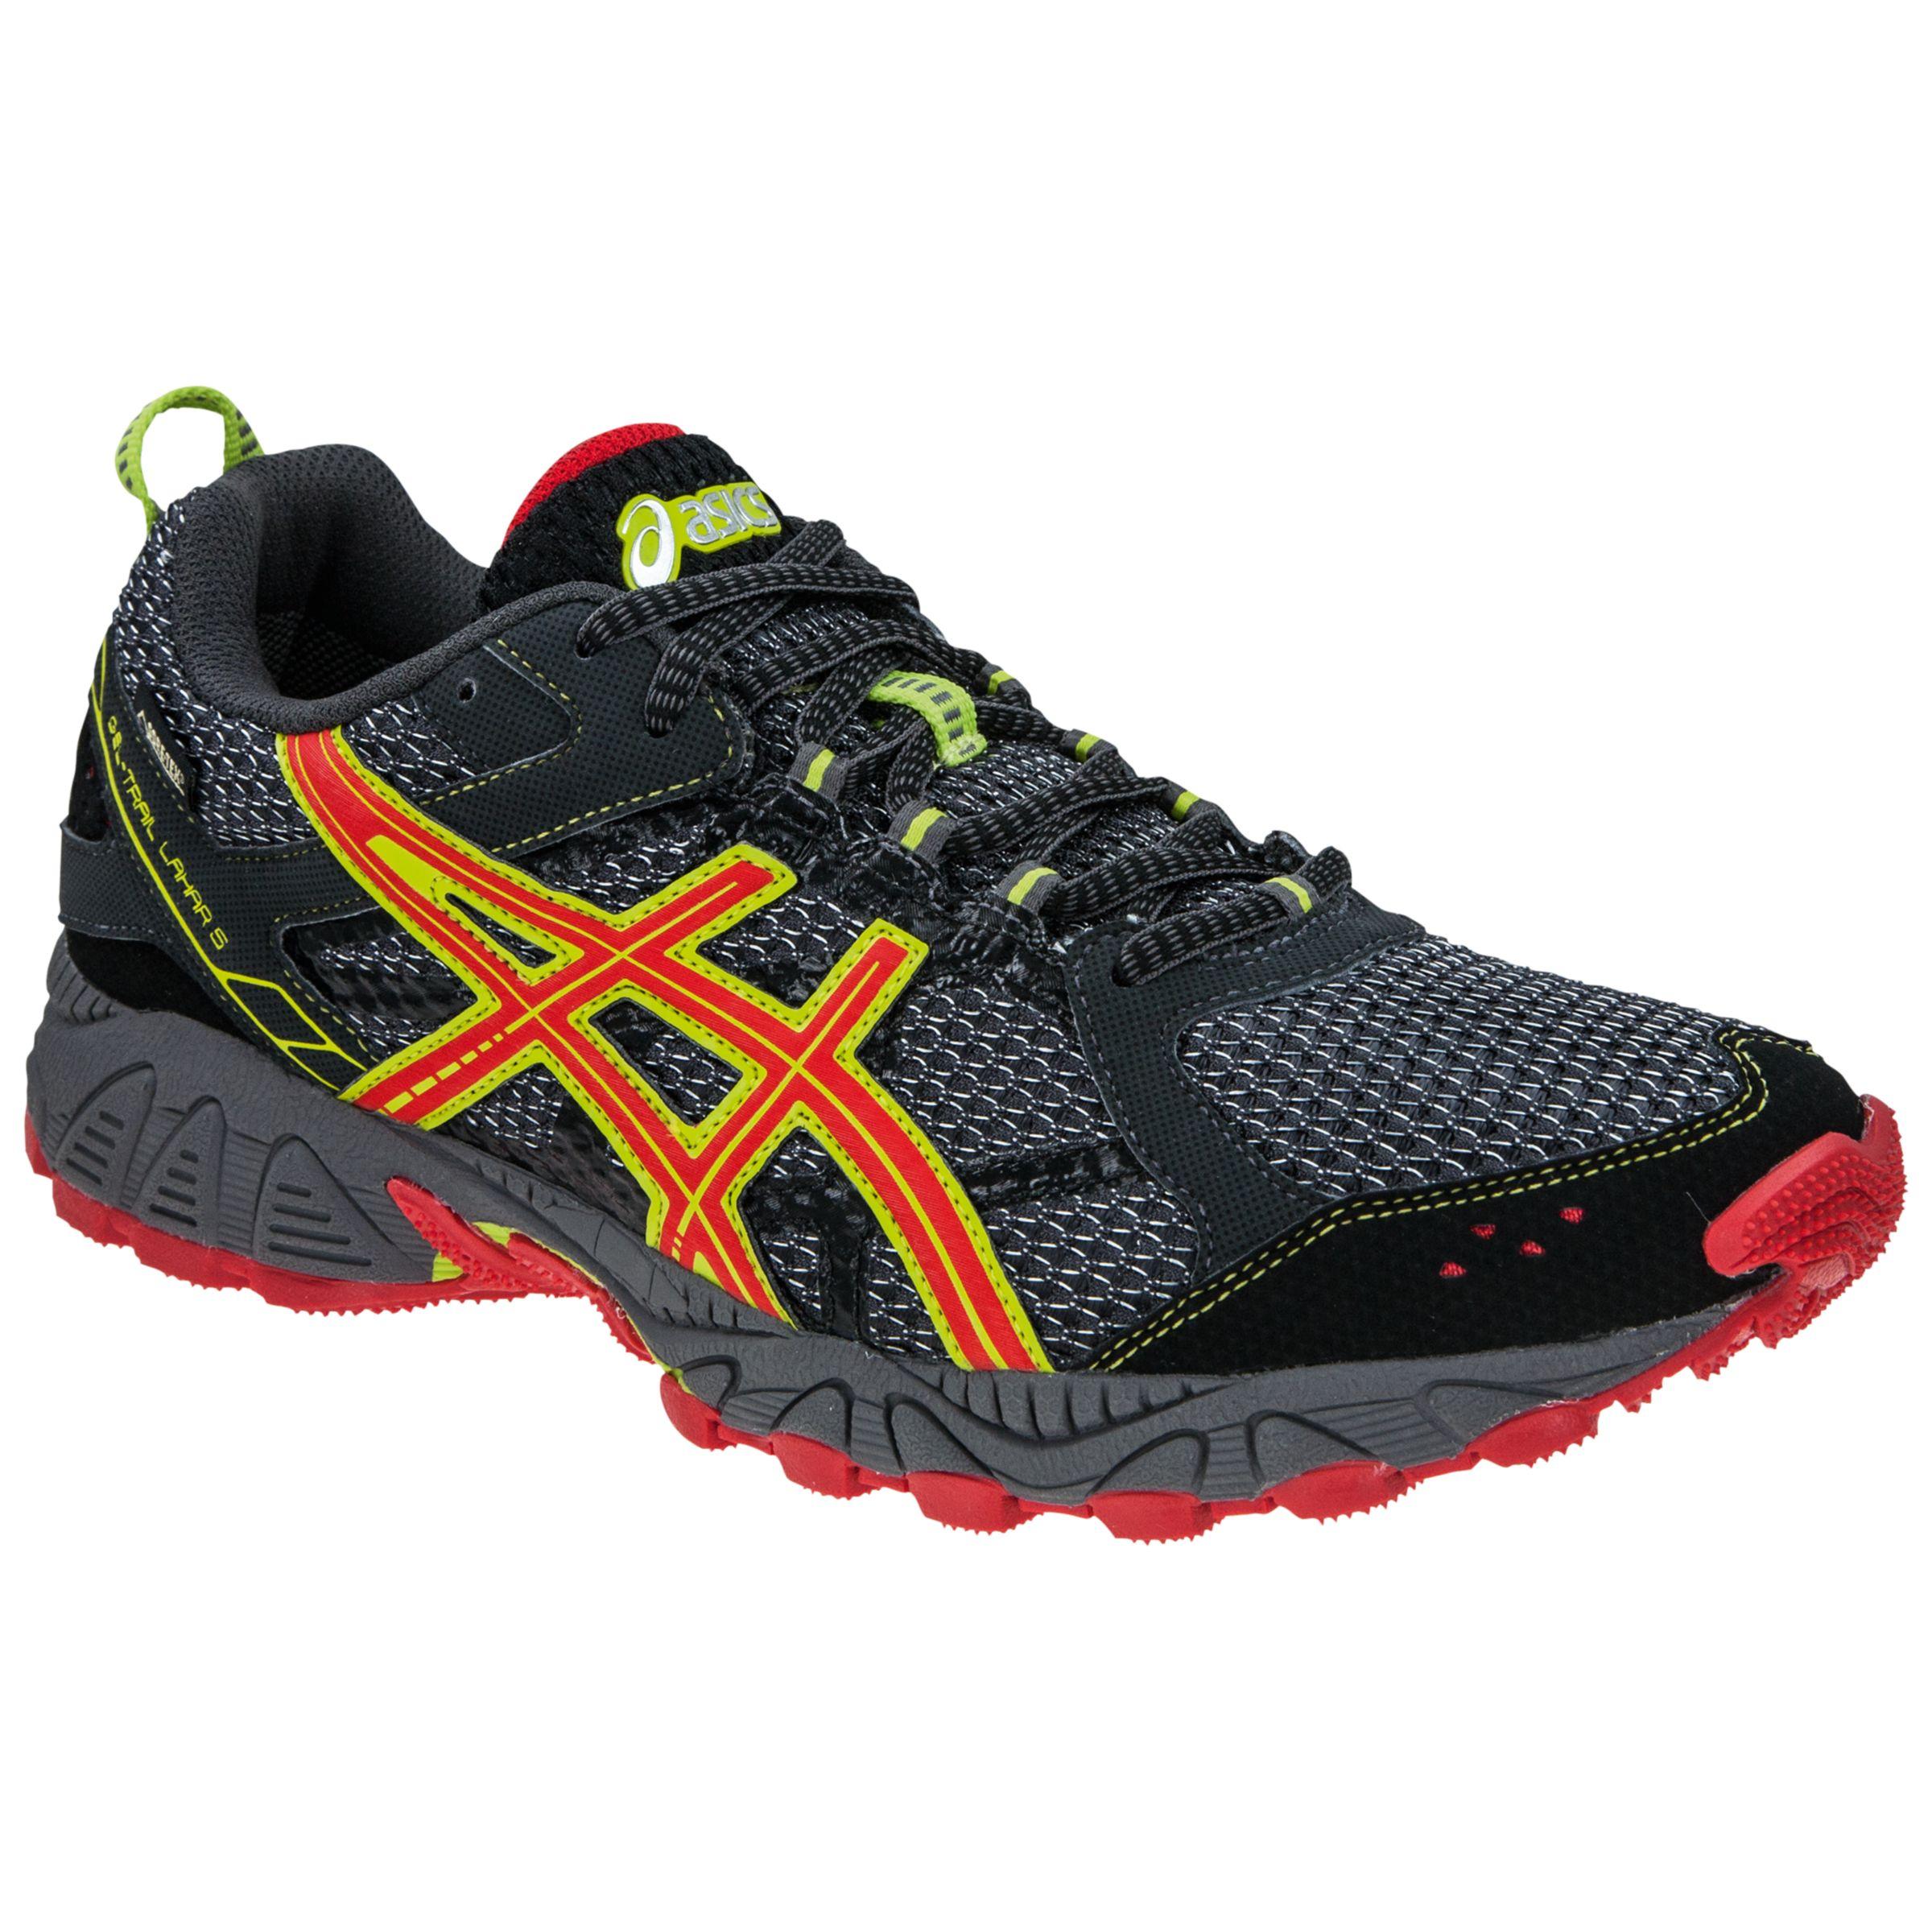 9b2e2c882eb82 Asics Men S Gel Trail Lahar 5 Gore Tex Running Shoes - Style Guru ...